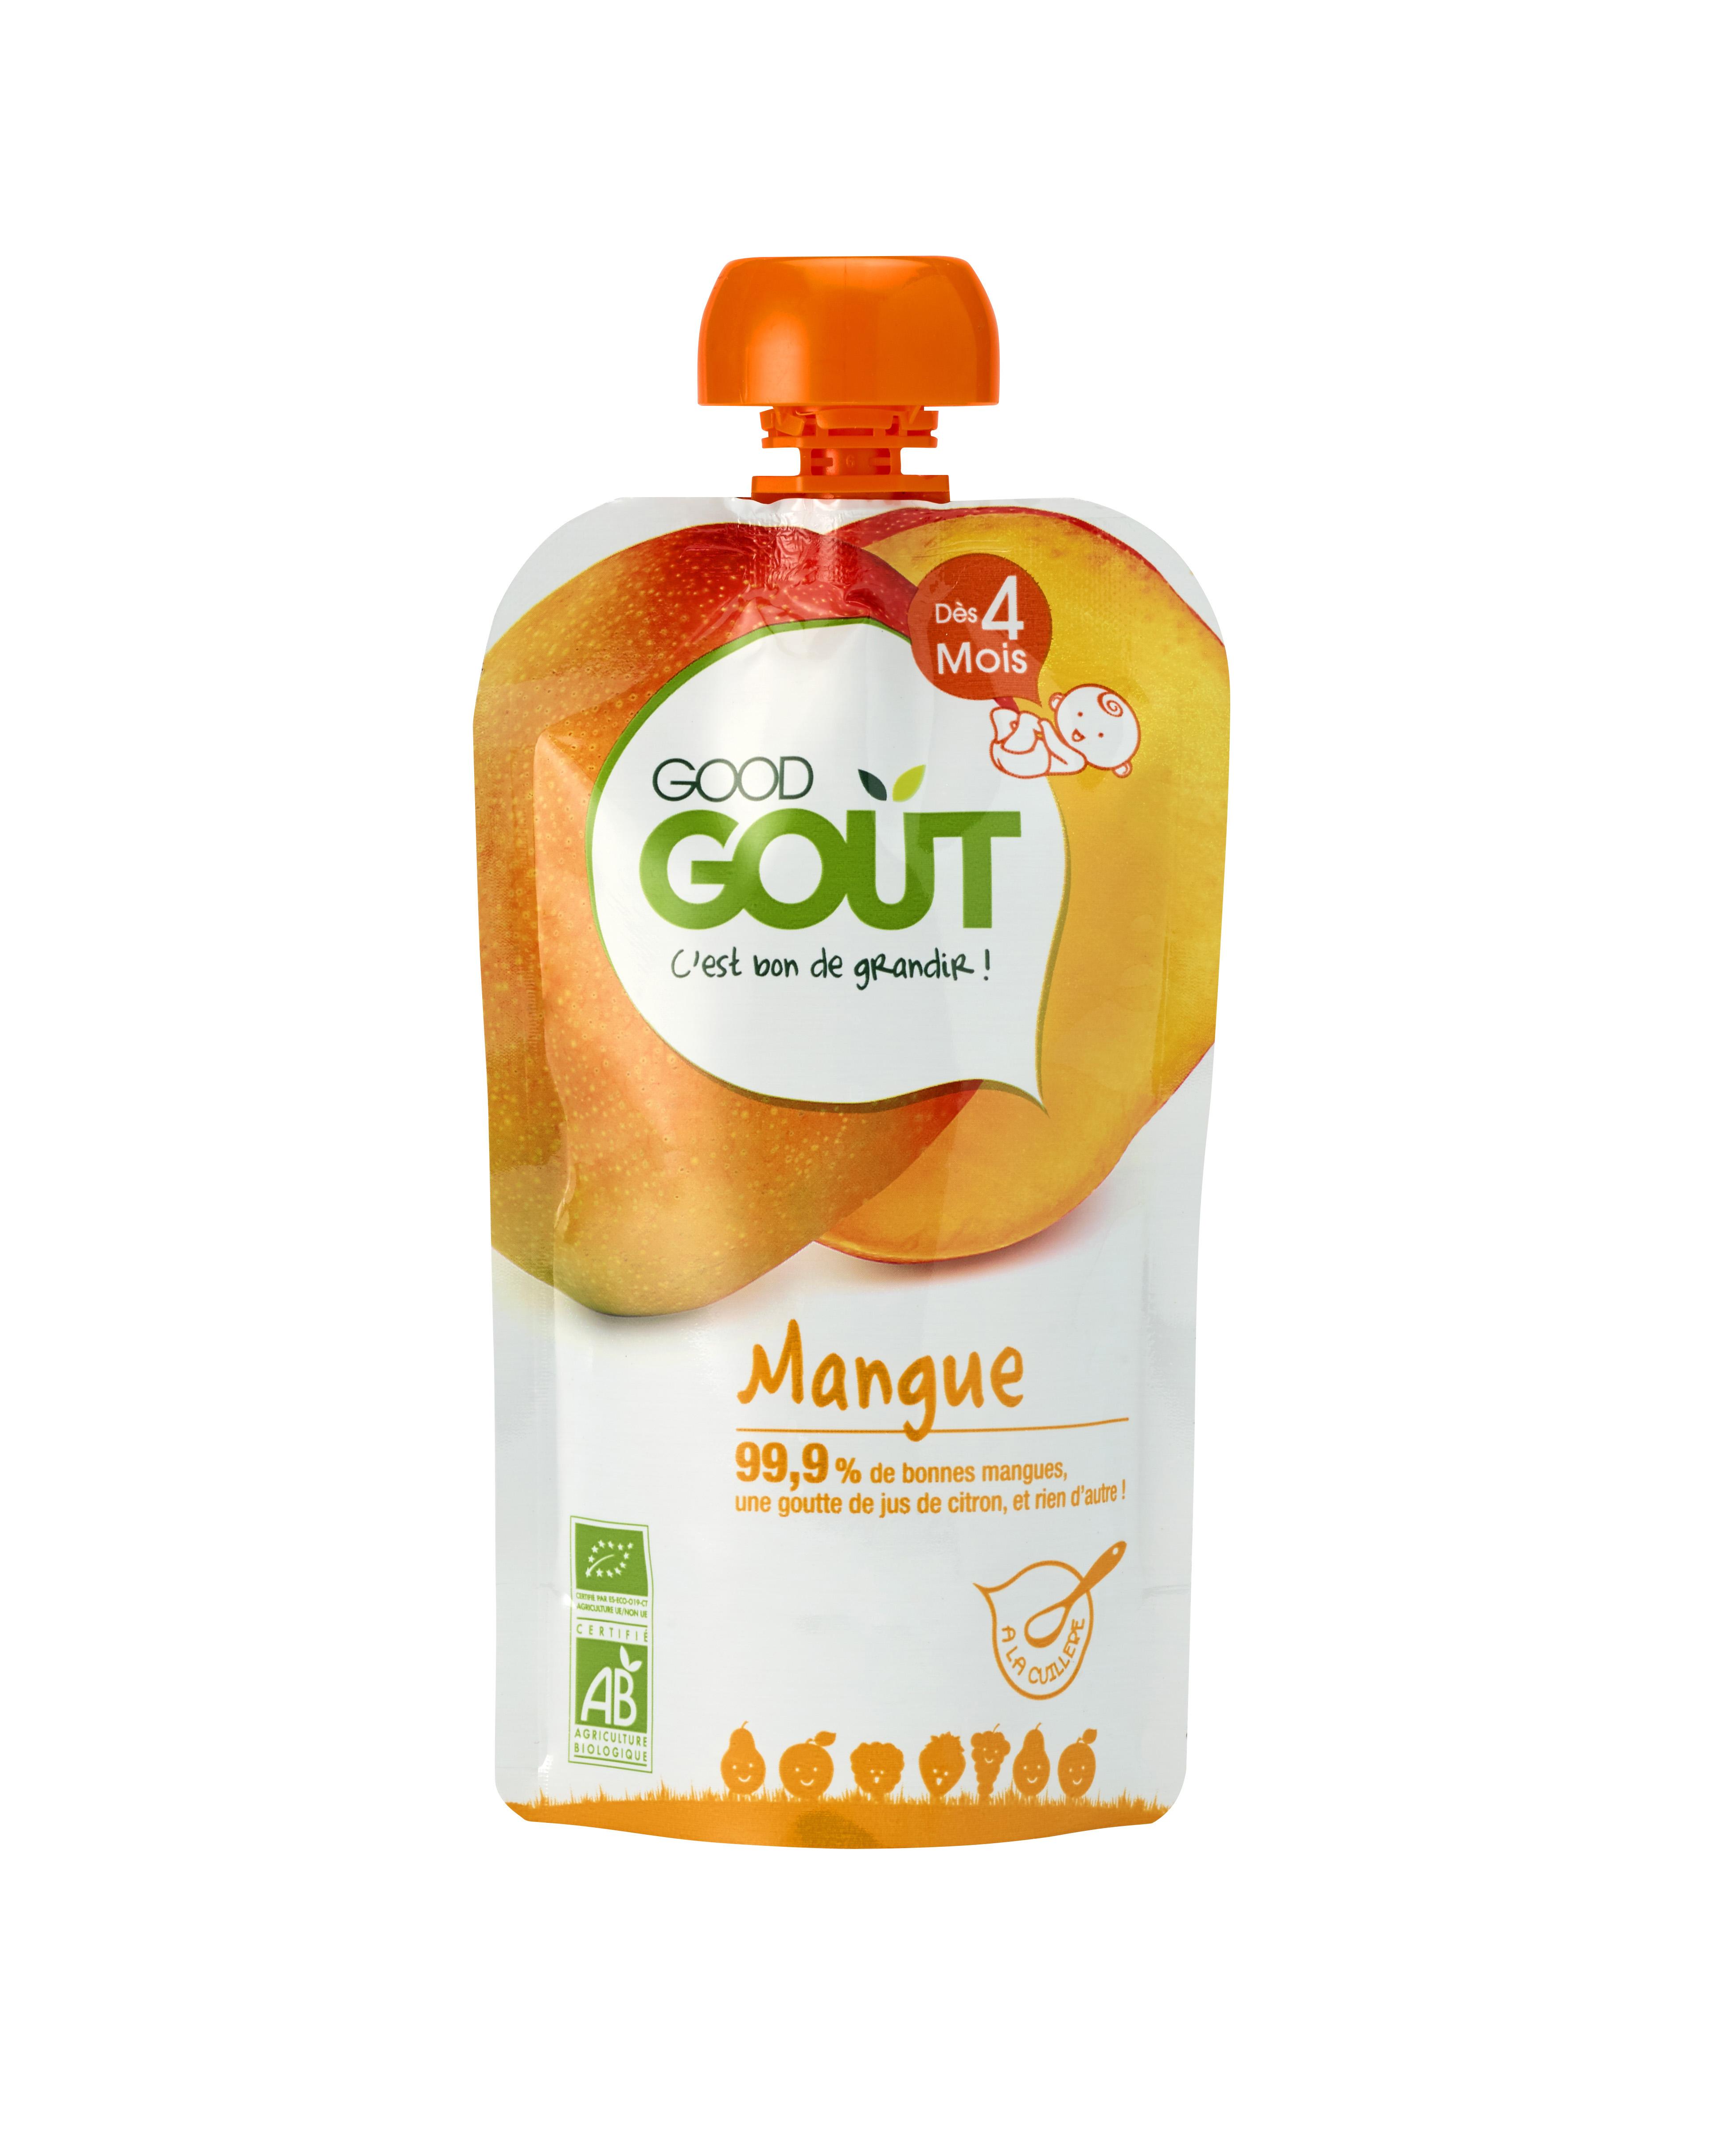 Good Gourde Mangue BIO, Good Goût (120 g) - dès 4 mois